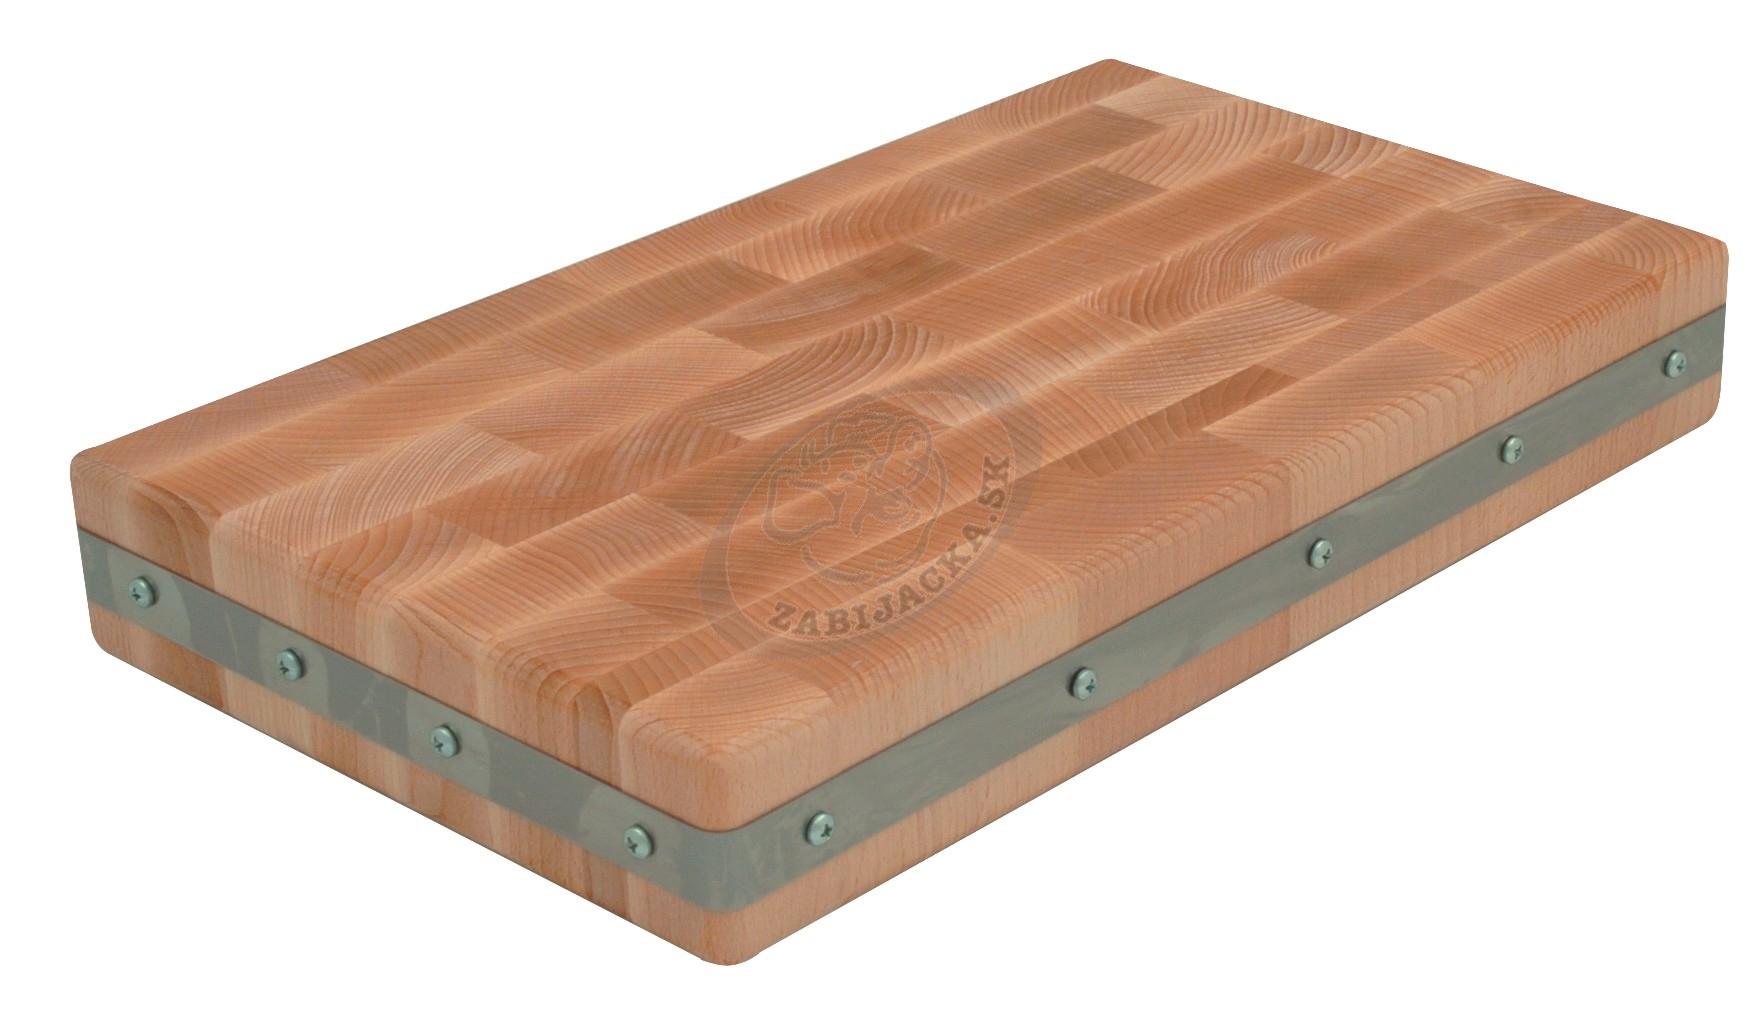 Mäsodoska drevená s nerez. obručou